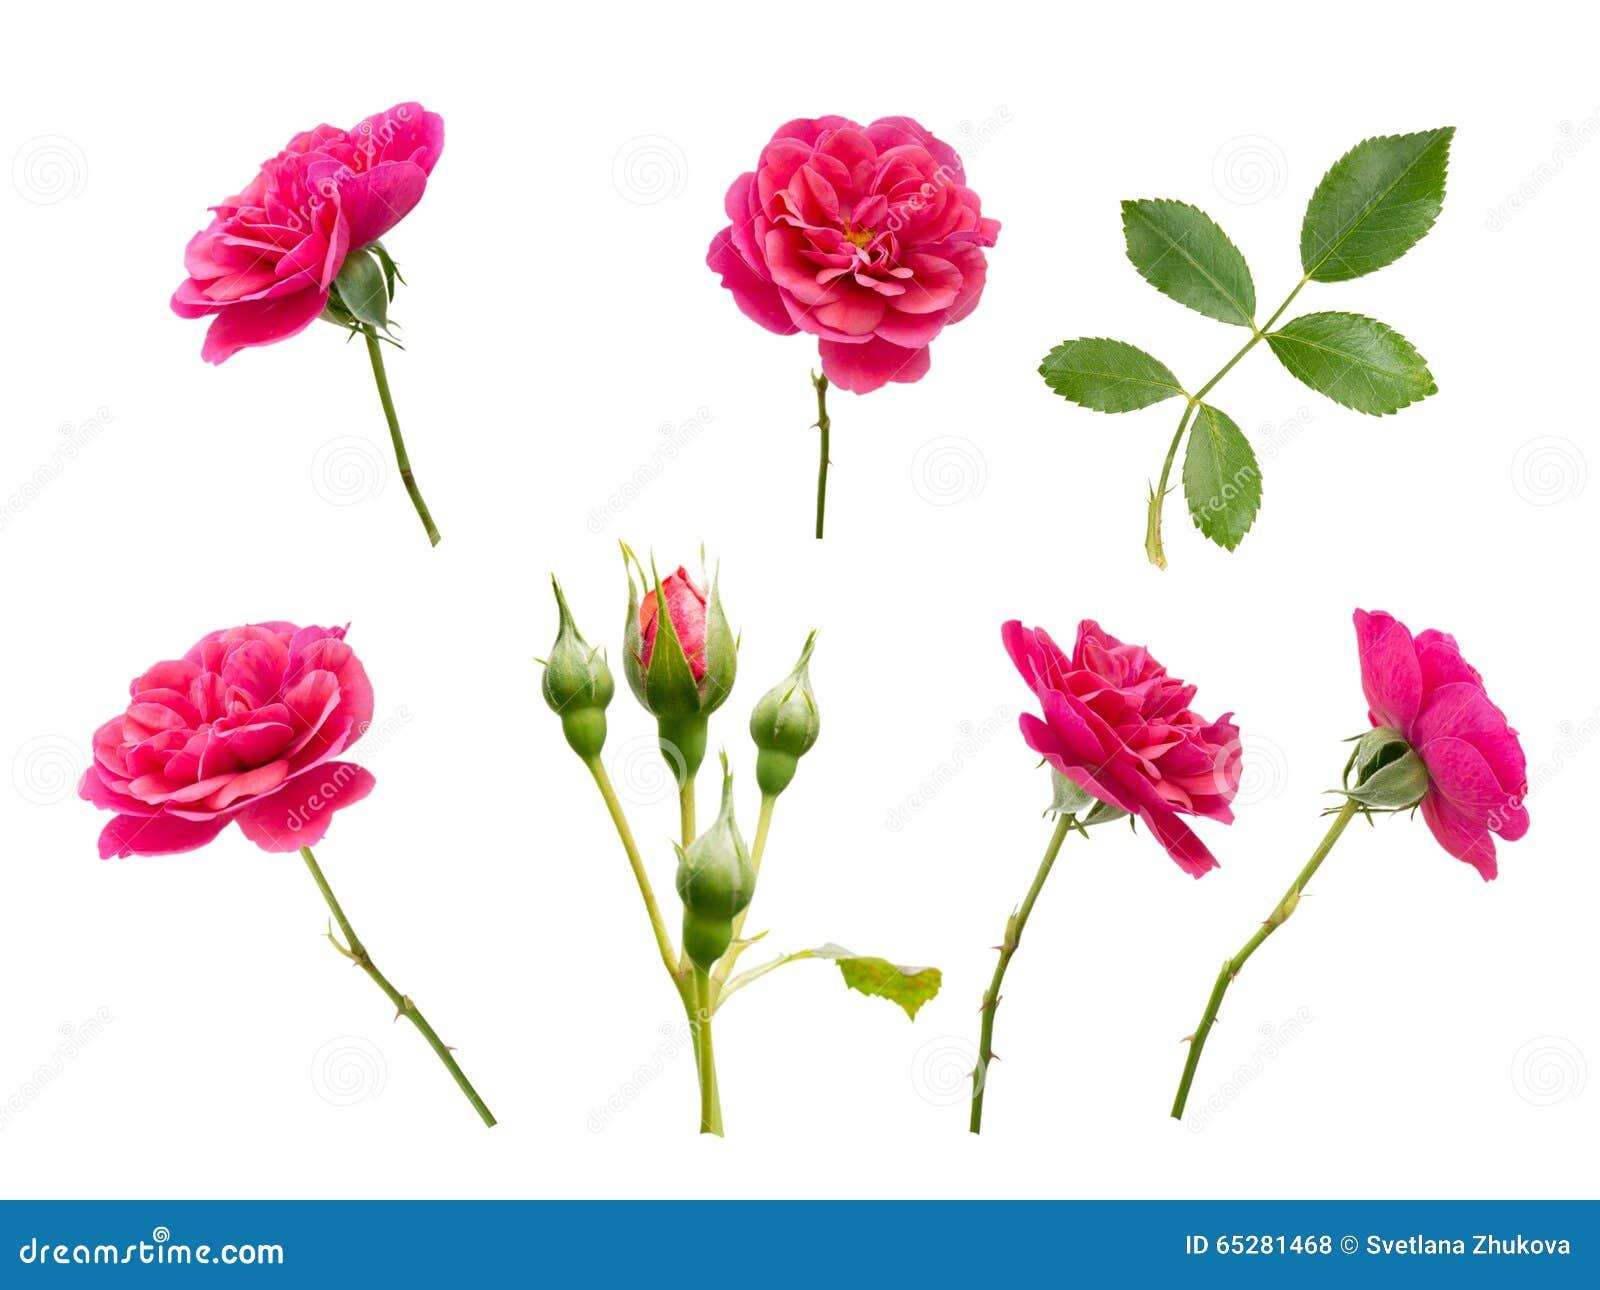 rosa rosen knospen und bl tter stockfoto bild 65281468. Black Bedroom Furniture Sets. Home Design Ideas